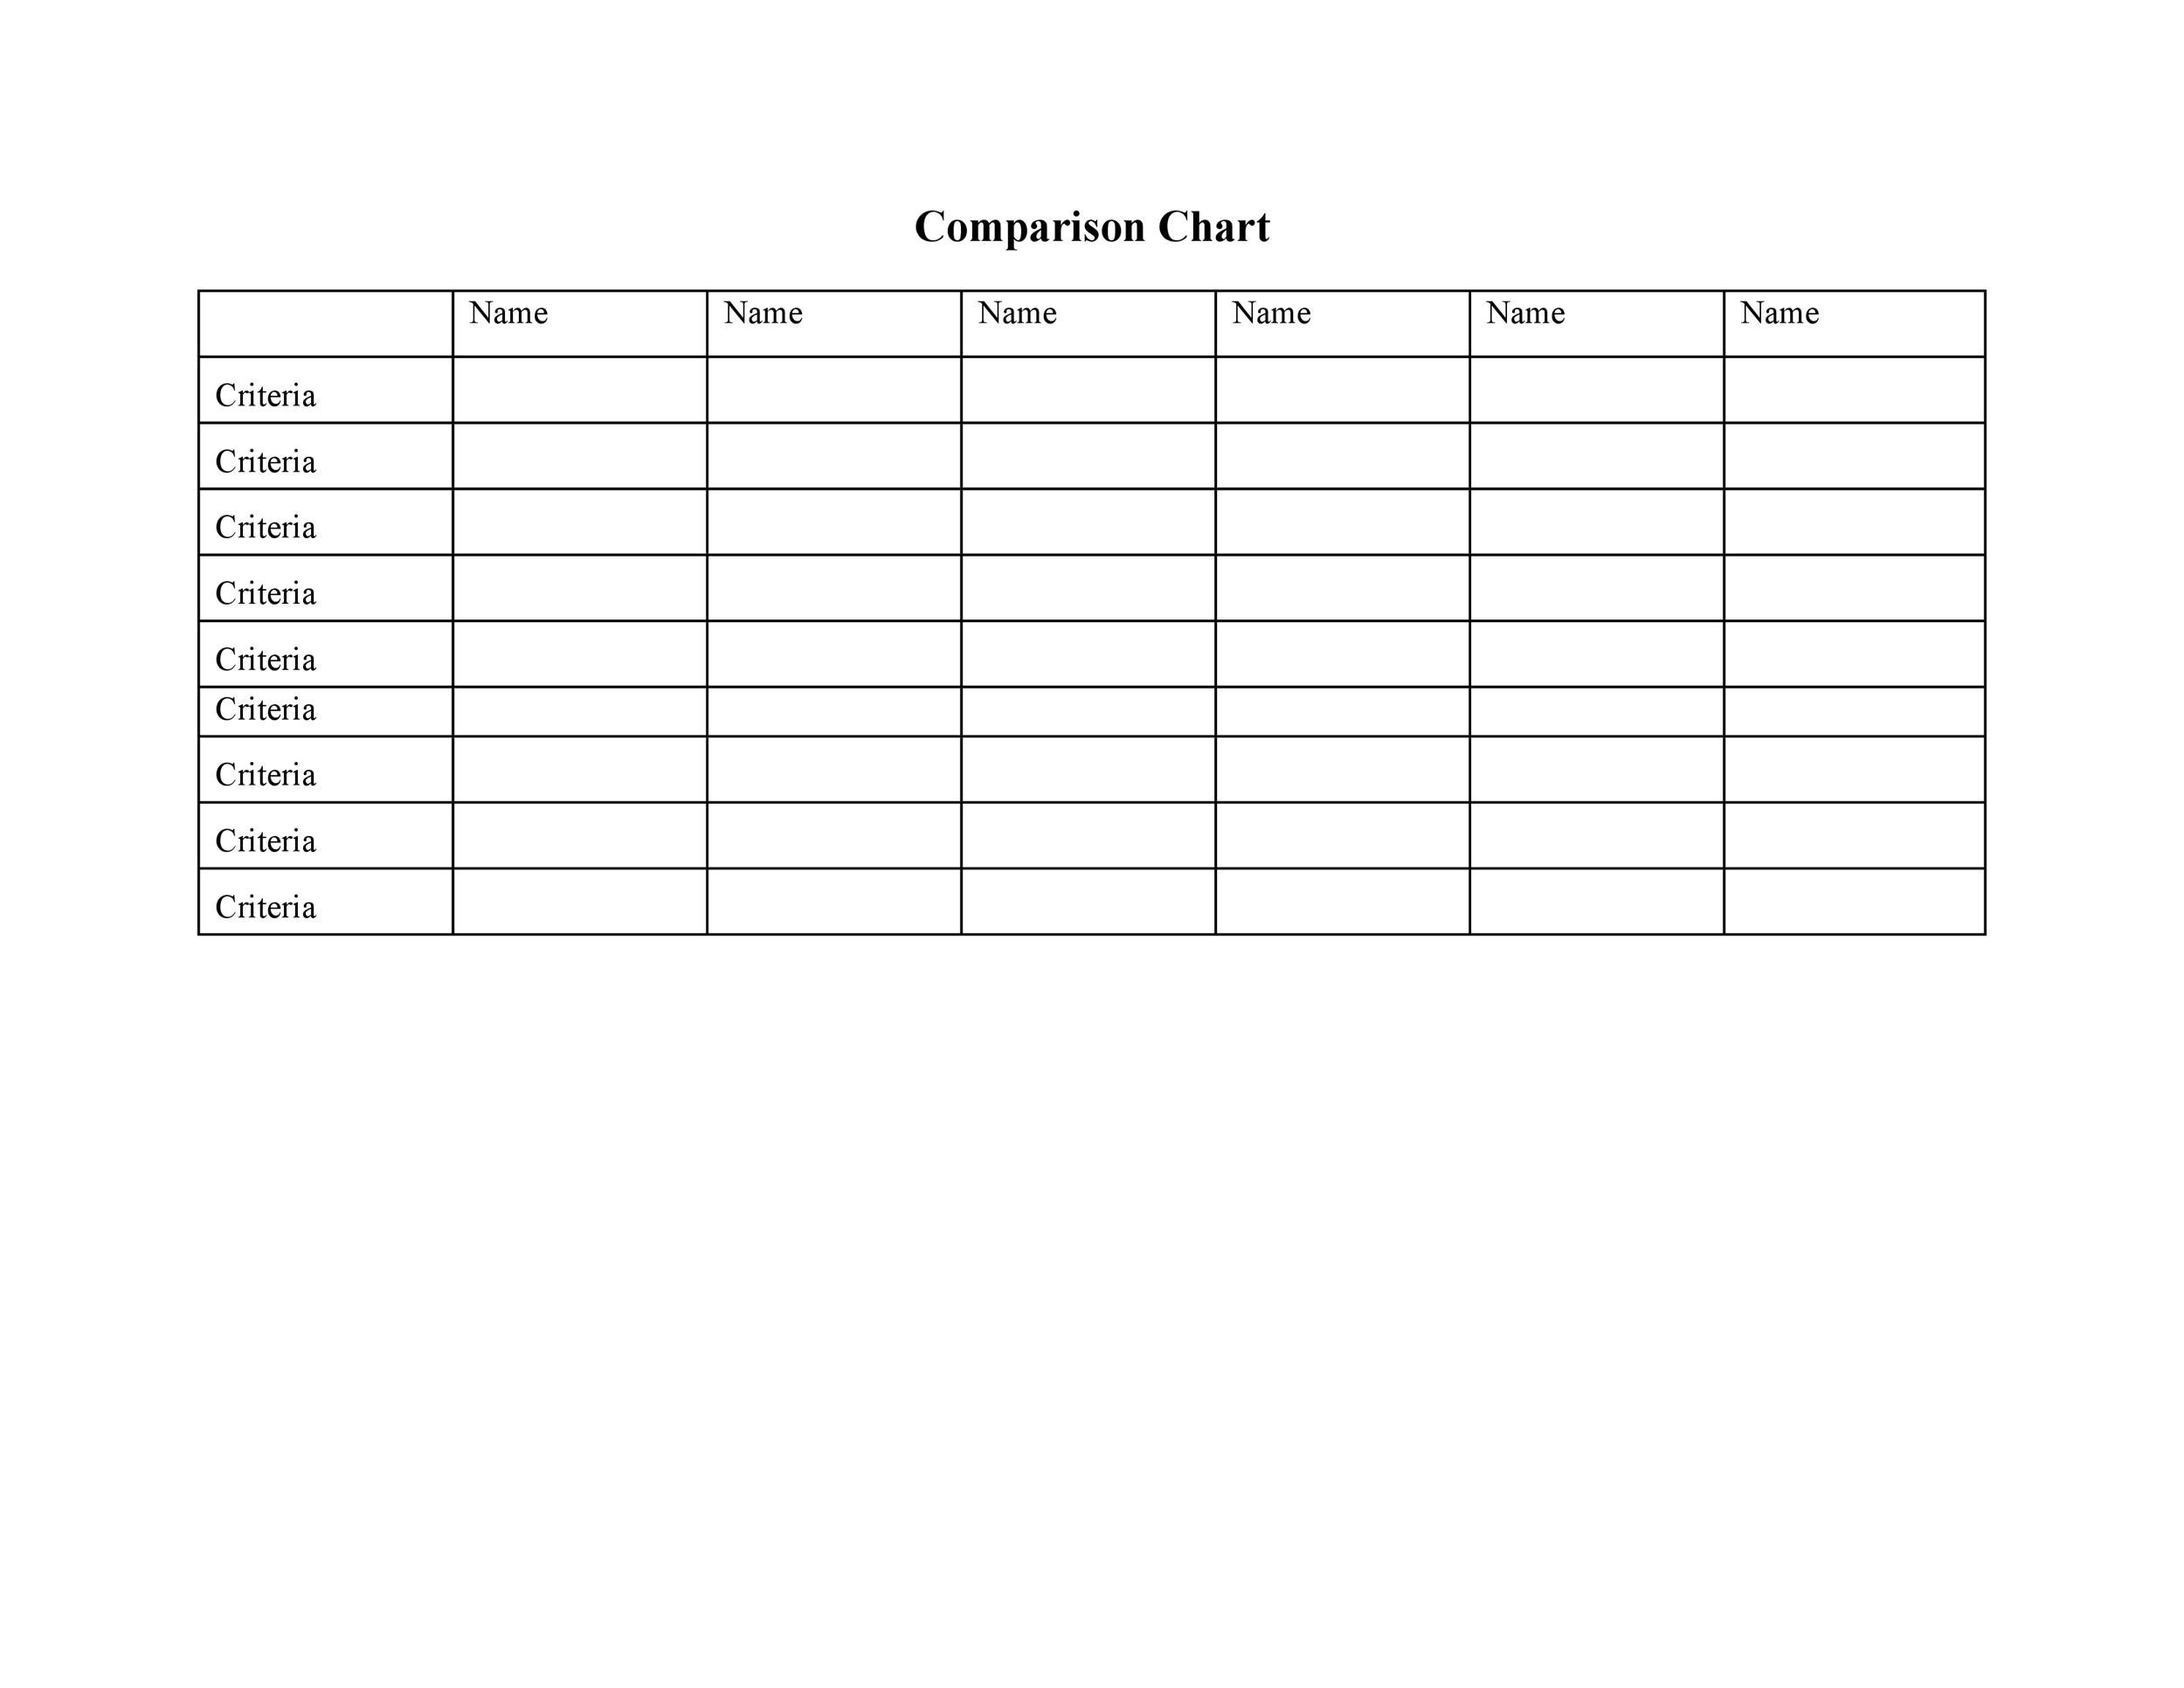 Free Comparison Chart Template 19